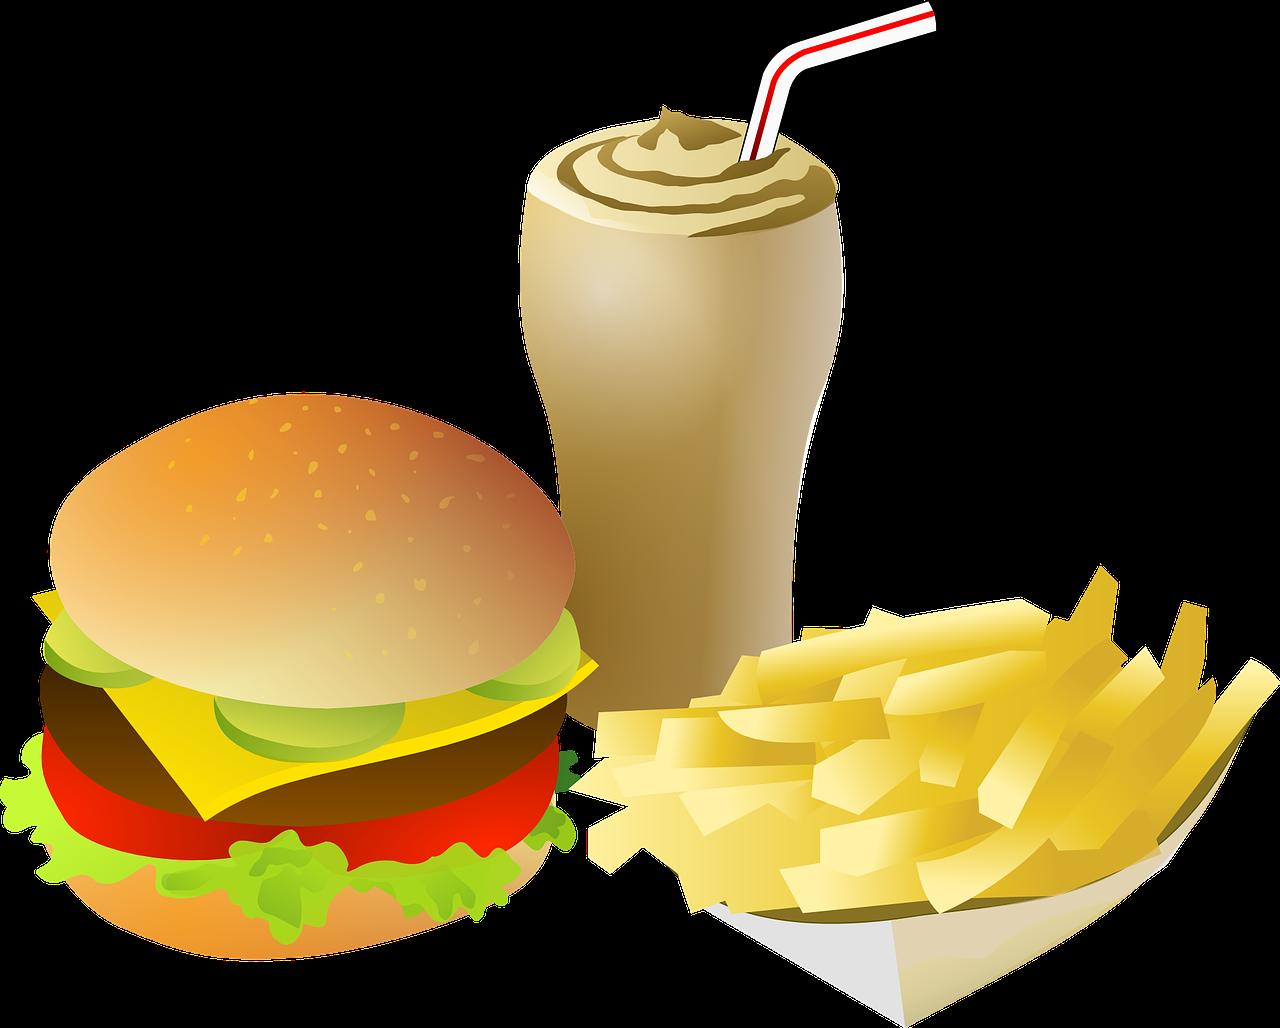 Fries clipart hat mcdonalds. Klinsman hinjaya s blog